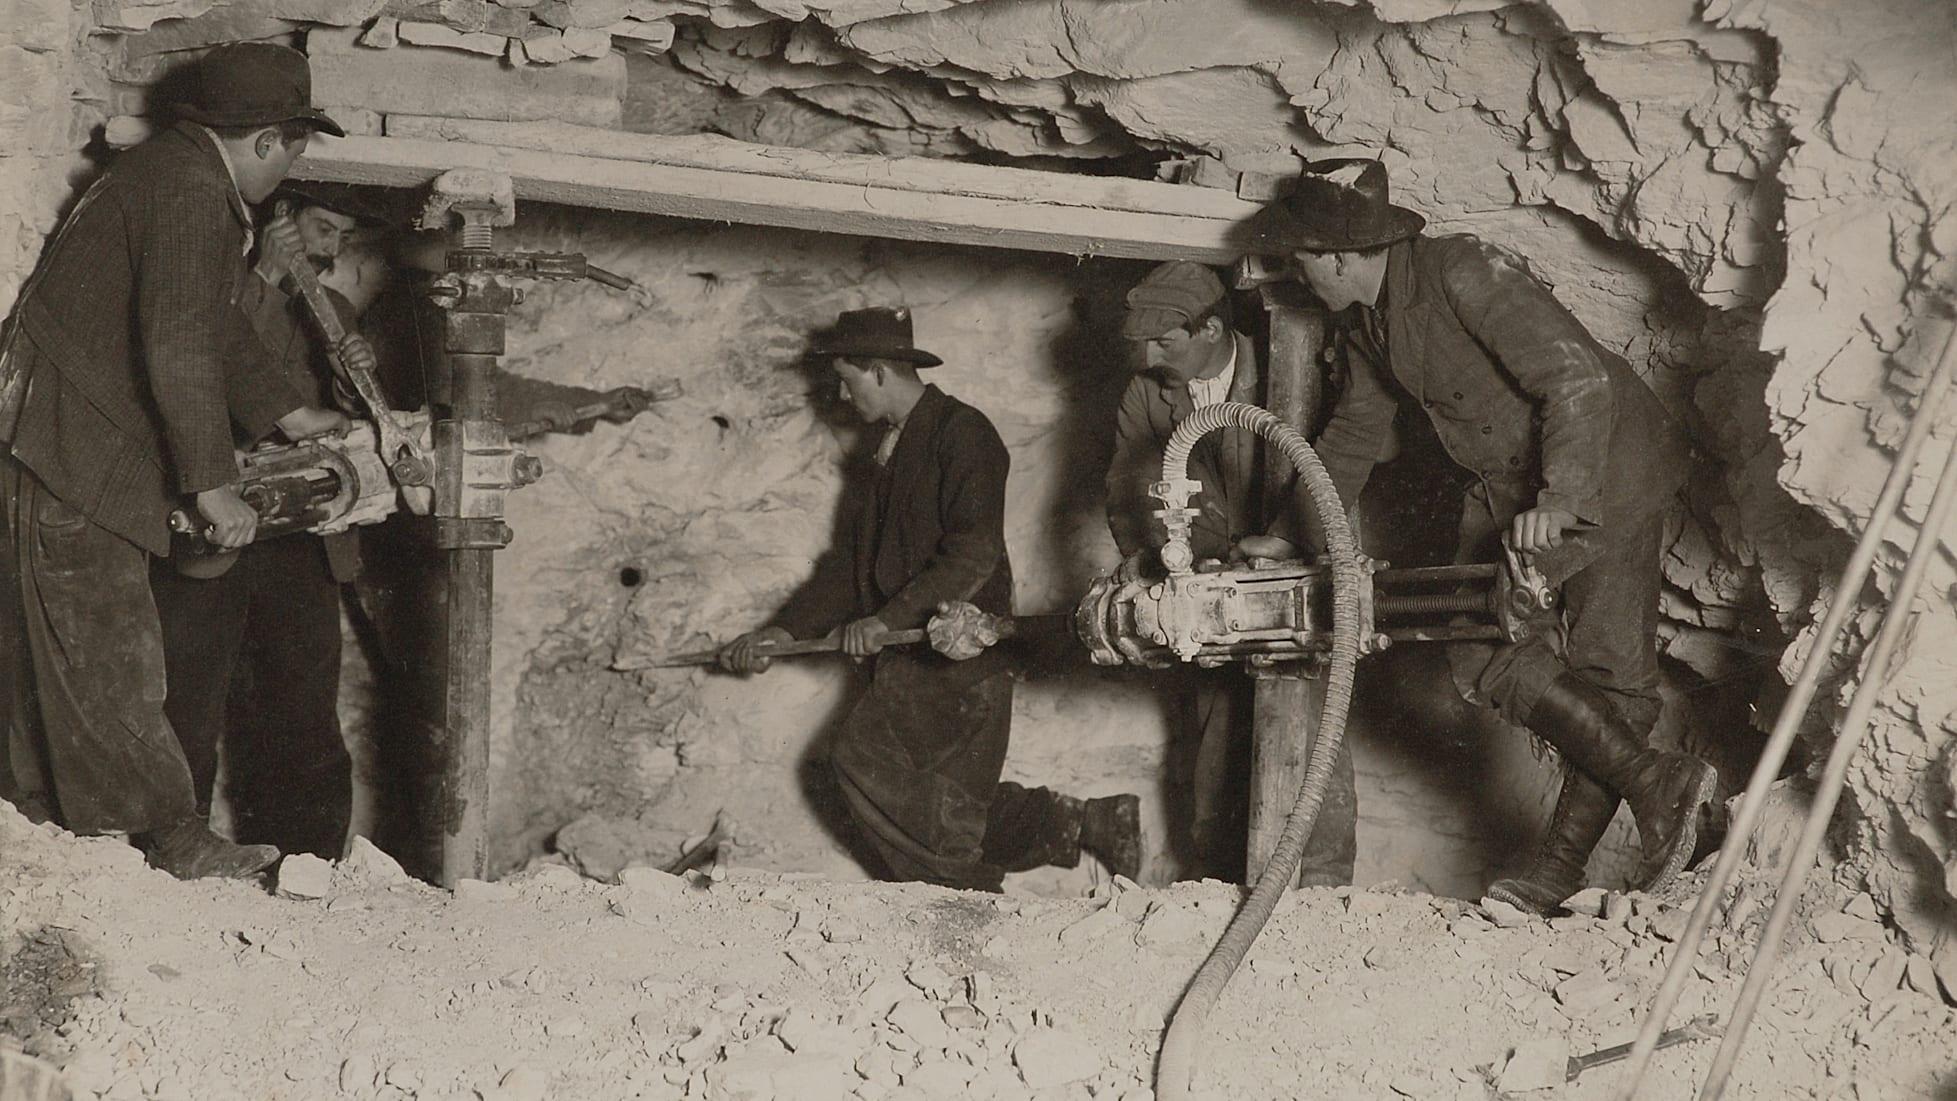 Jungfrau bahn nostalgie jungfraujoch druchstich 1912 02